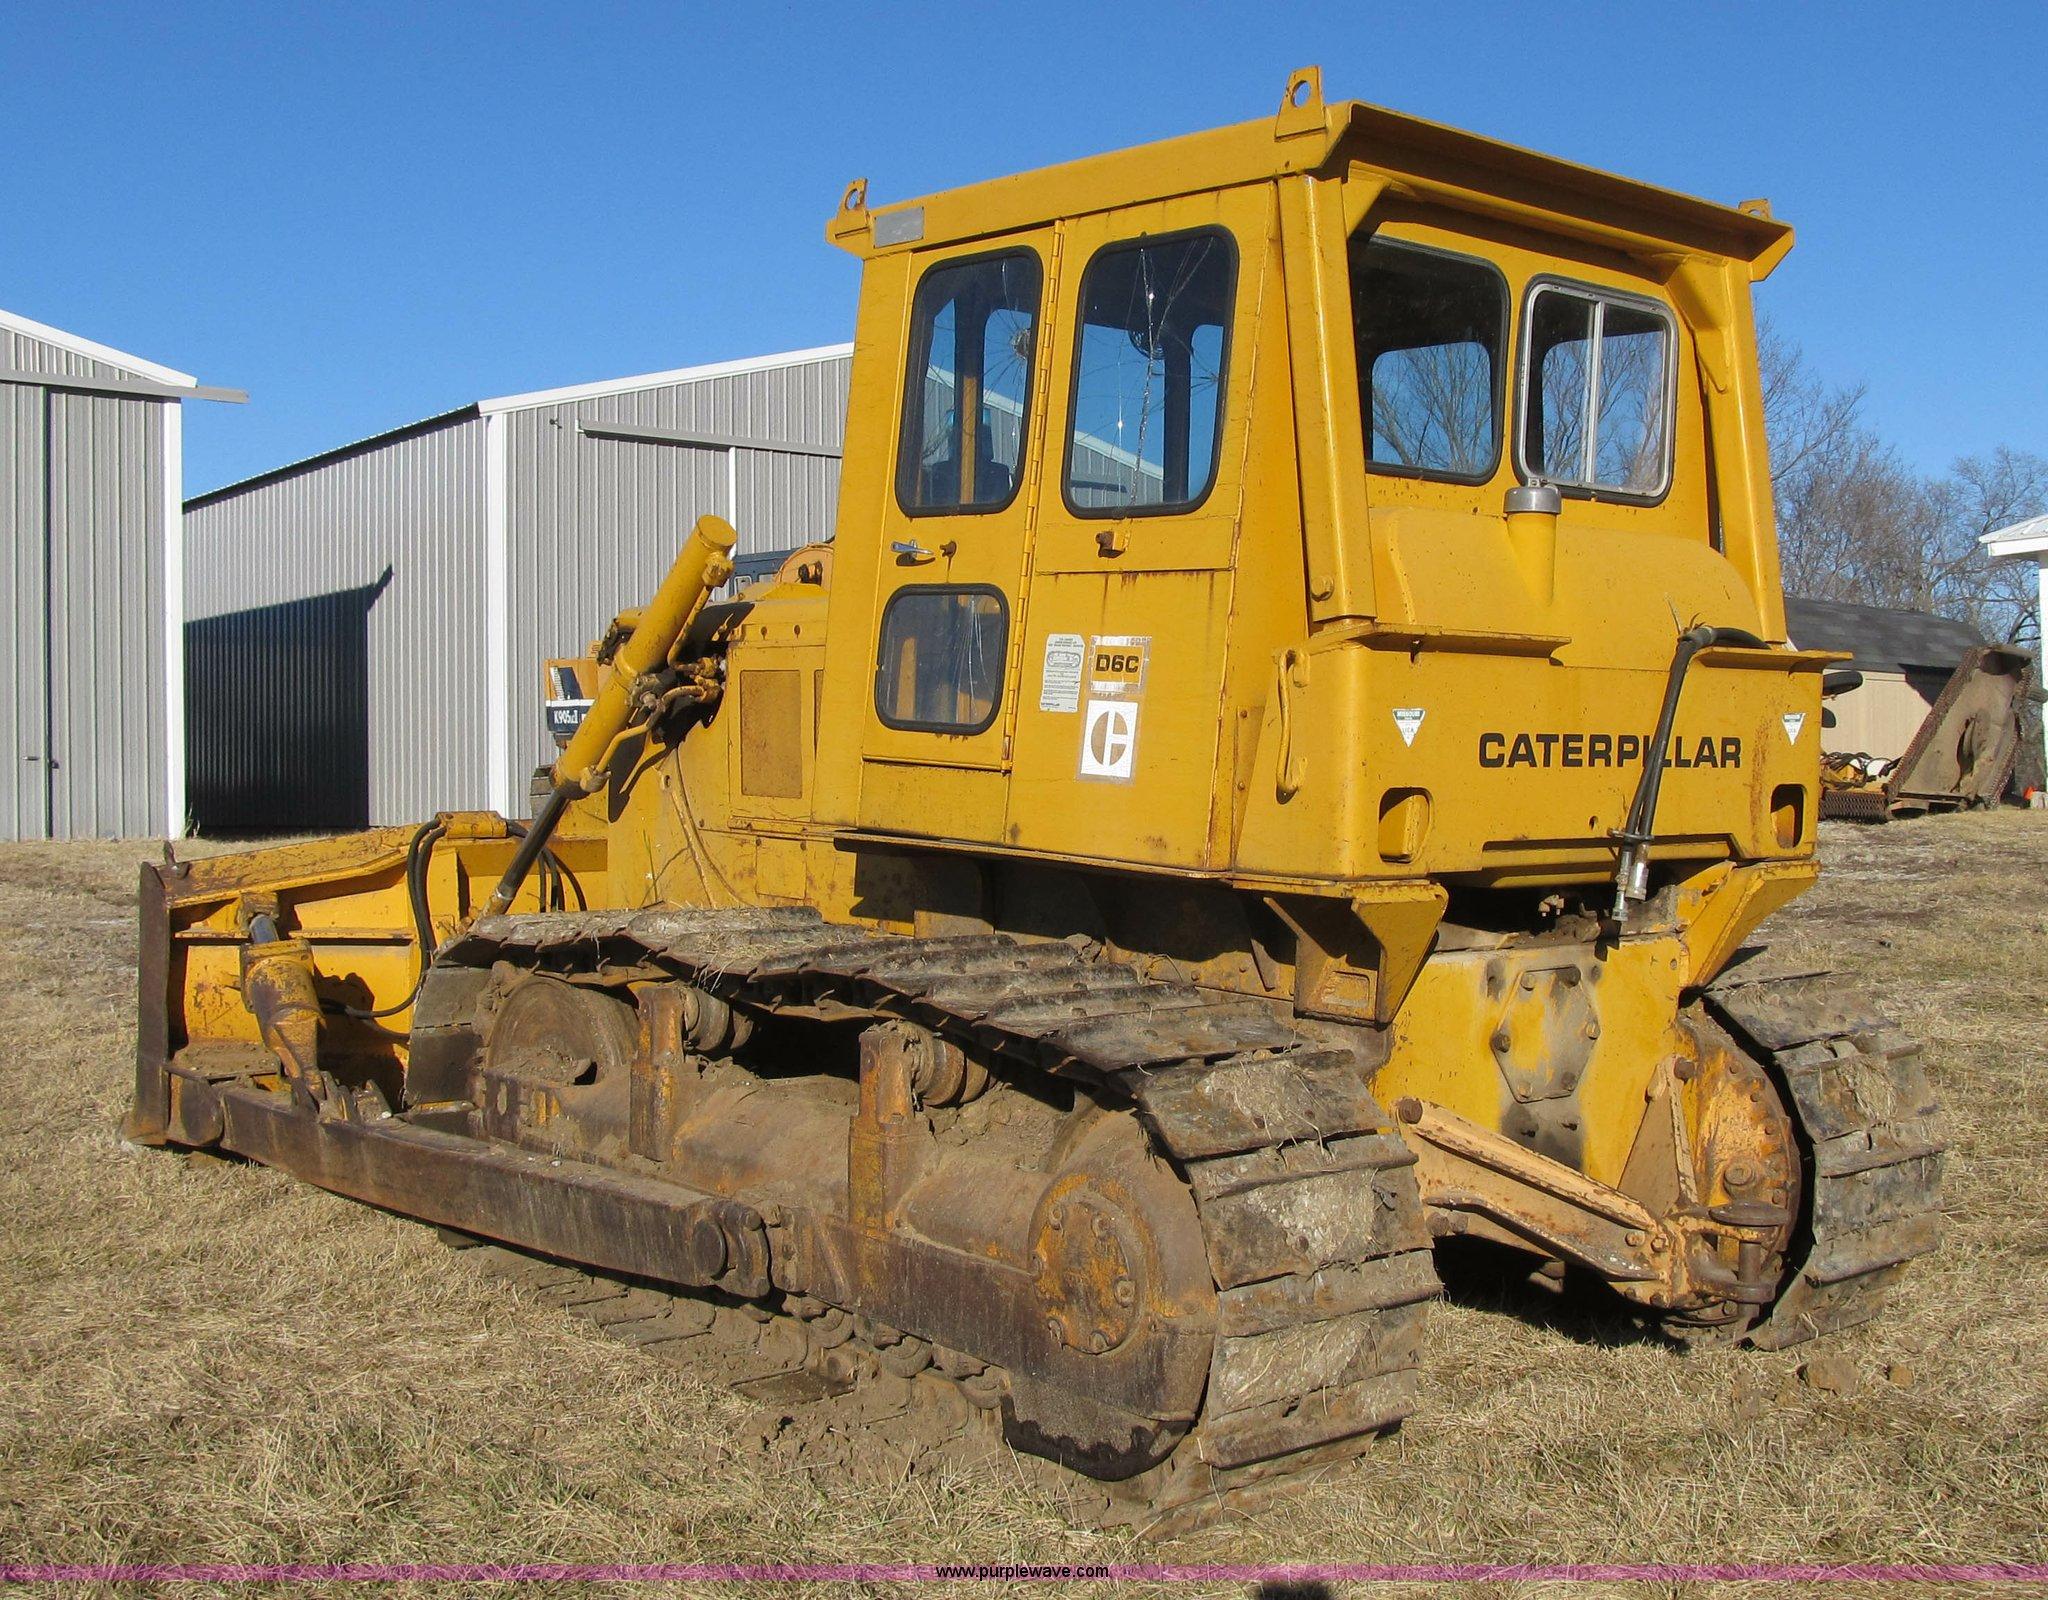 F8899B 1973 caterpillar d6c dozer item f8899 sold! february 26 Caterpillar D6C 10K at gsmx.co